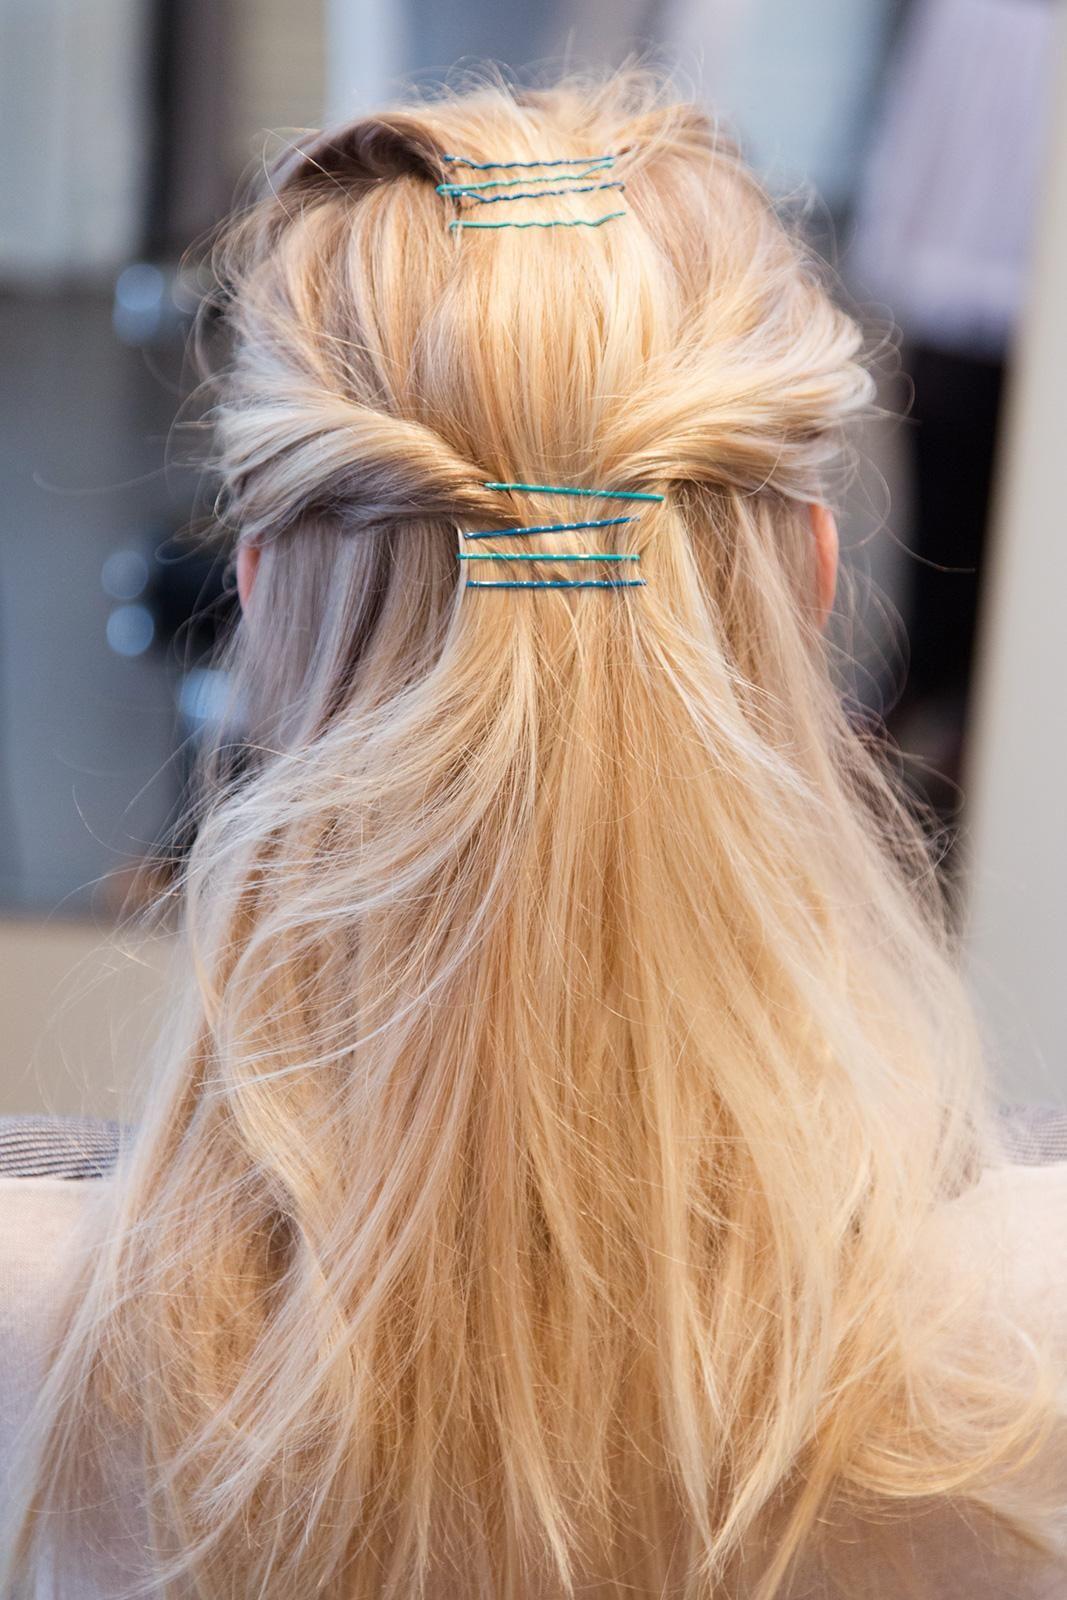 How to avoid hat hair cute easy styles pinterest bobby